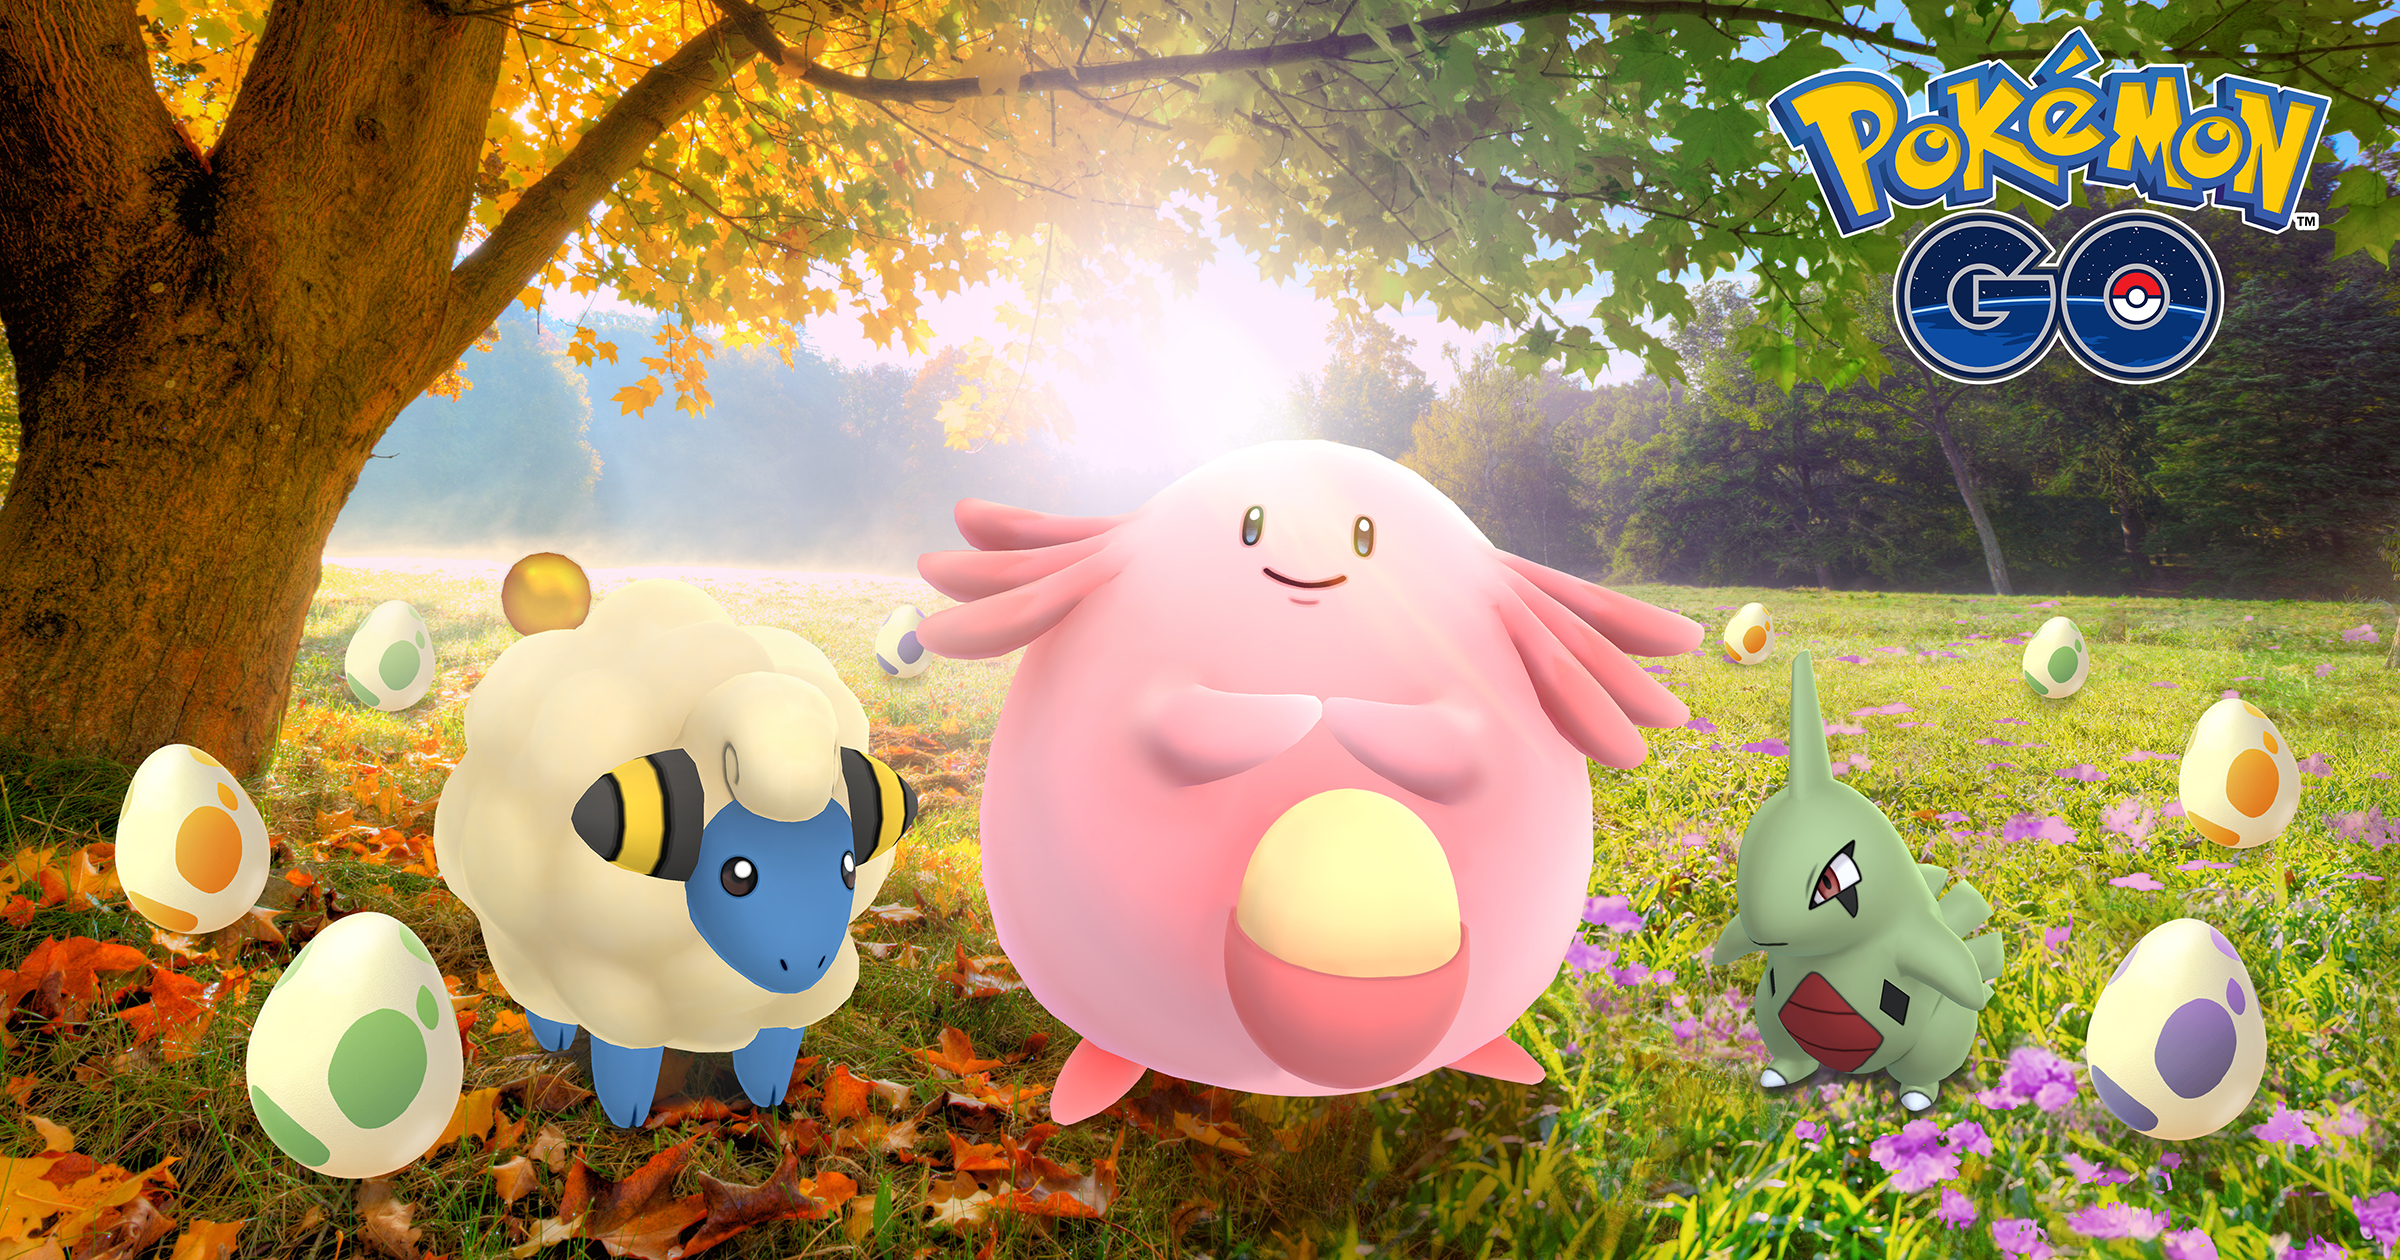 evento equinozio su pokémon go